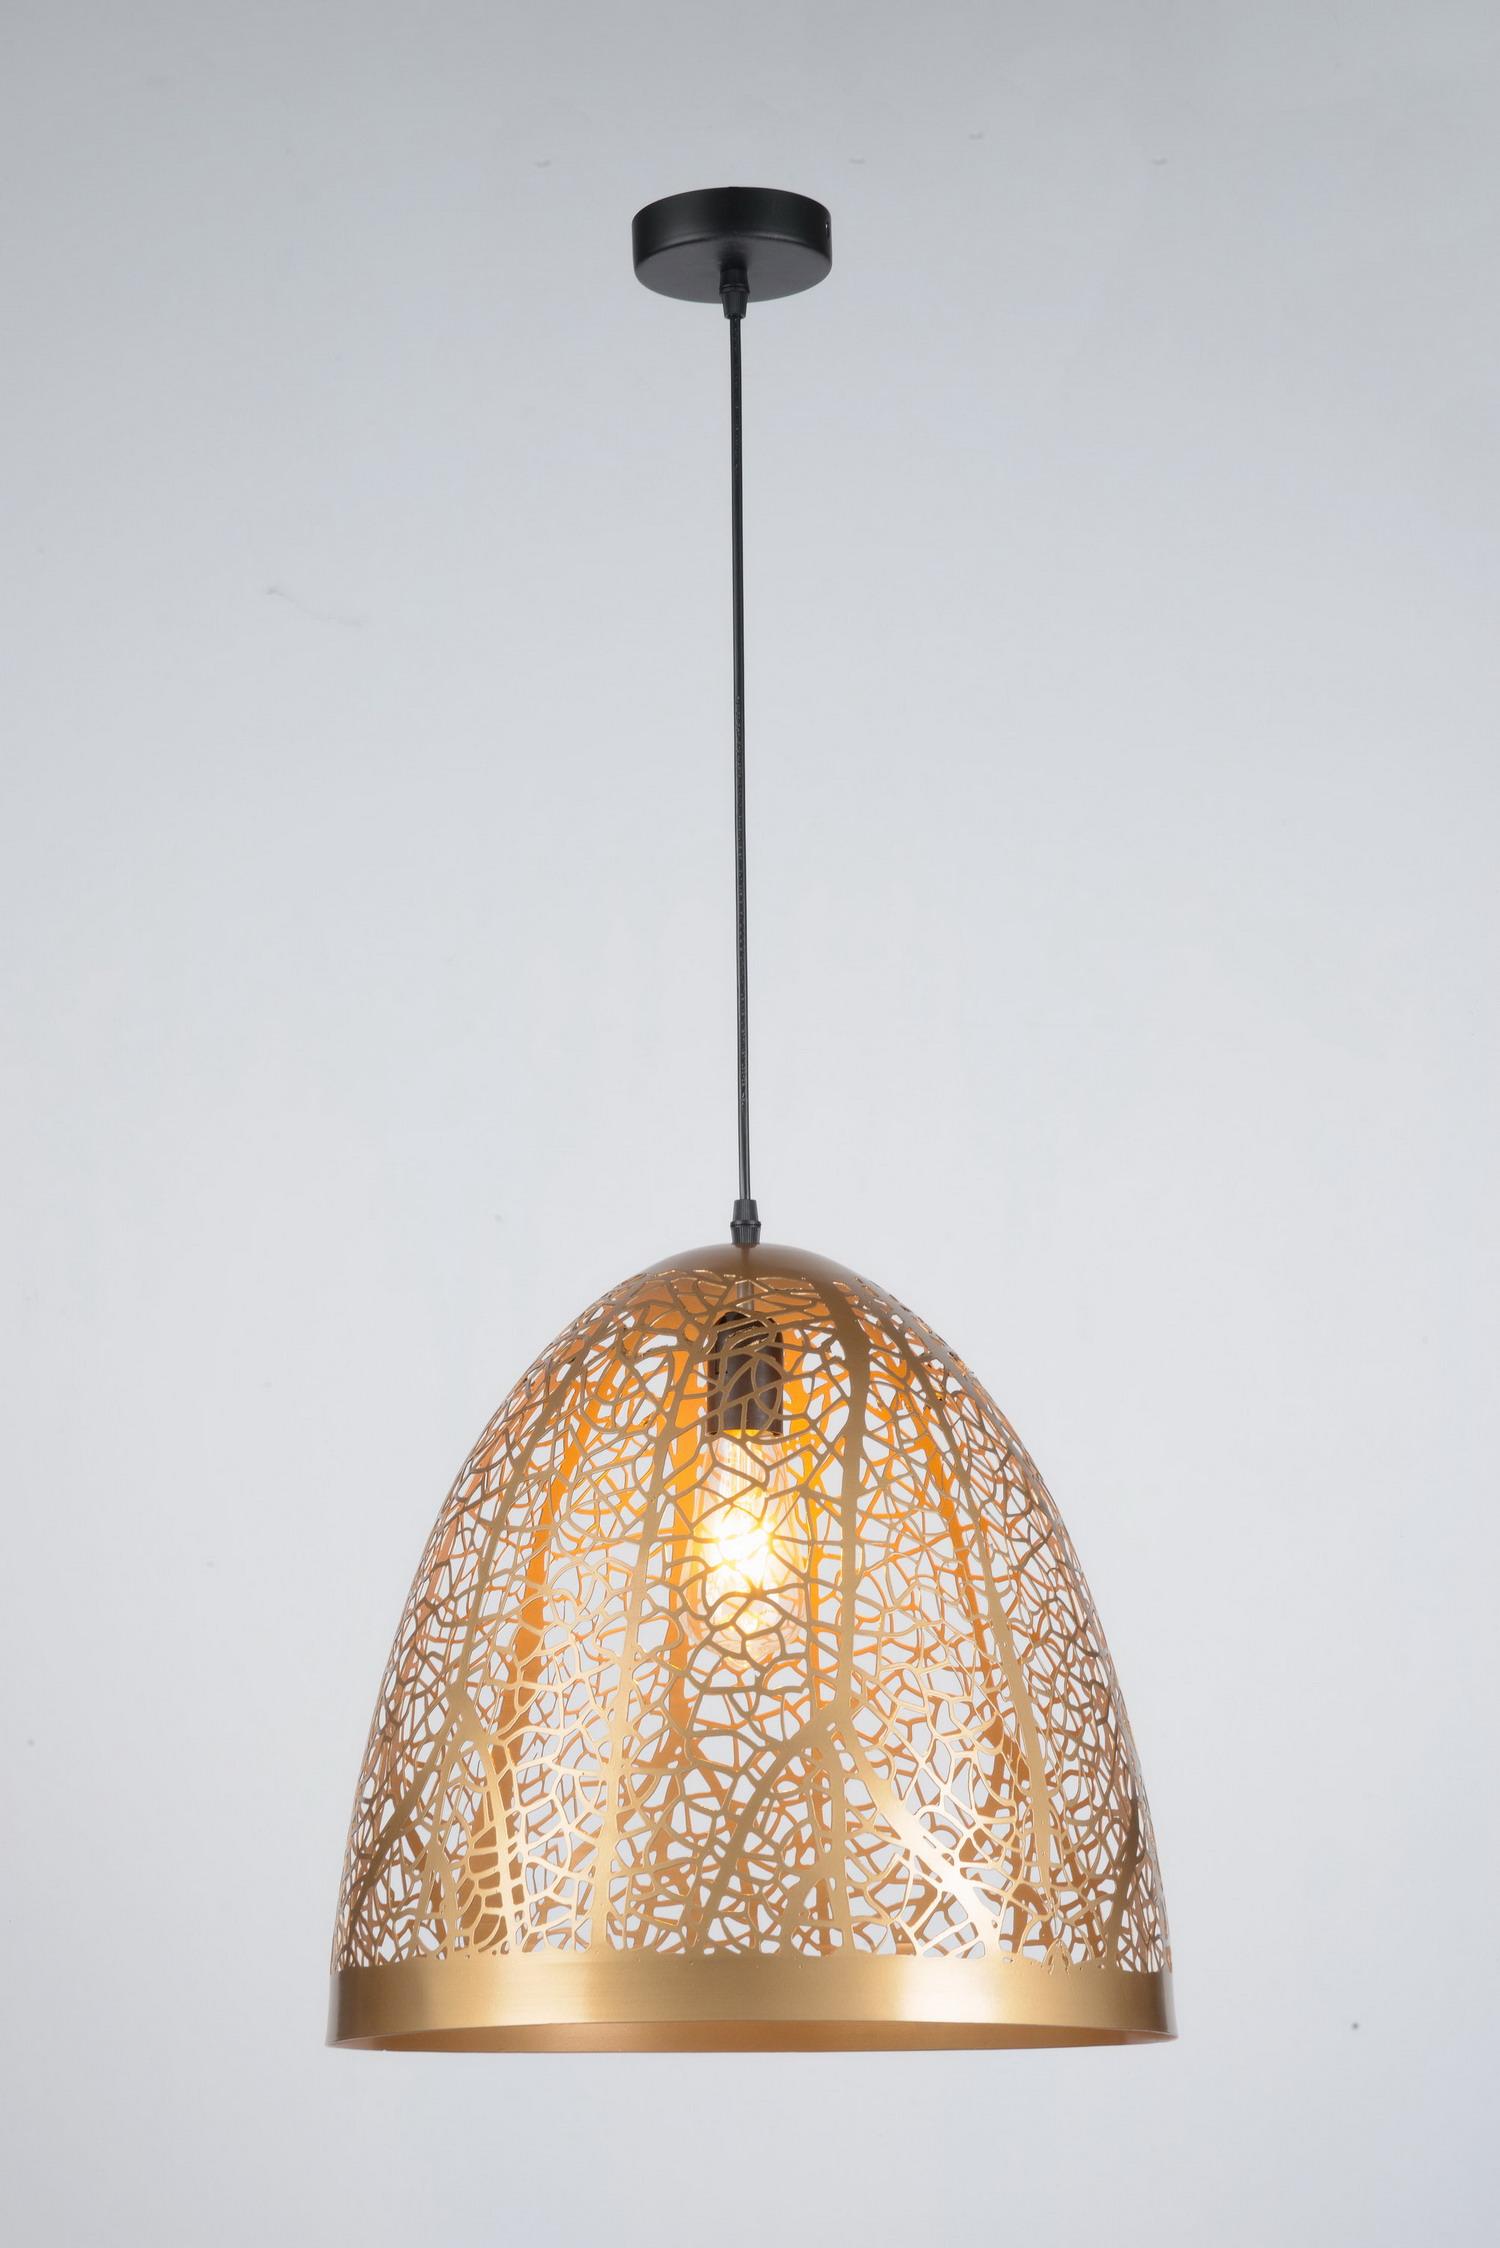 CORROSION PENDANT LAMP